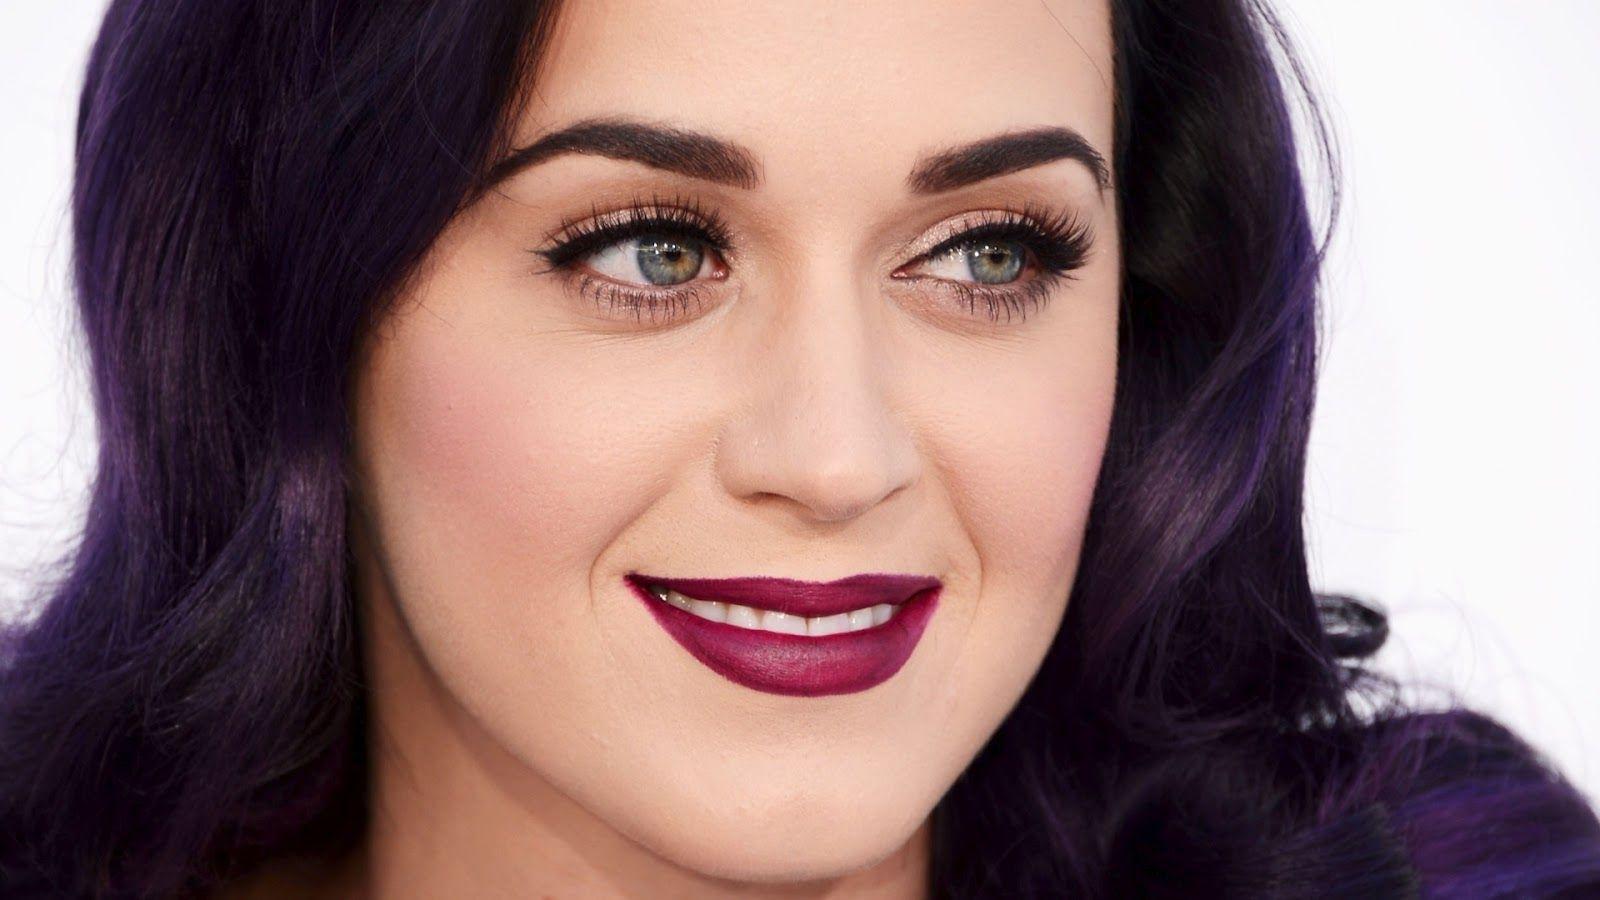 Purple hair - Katy Perry